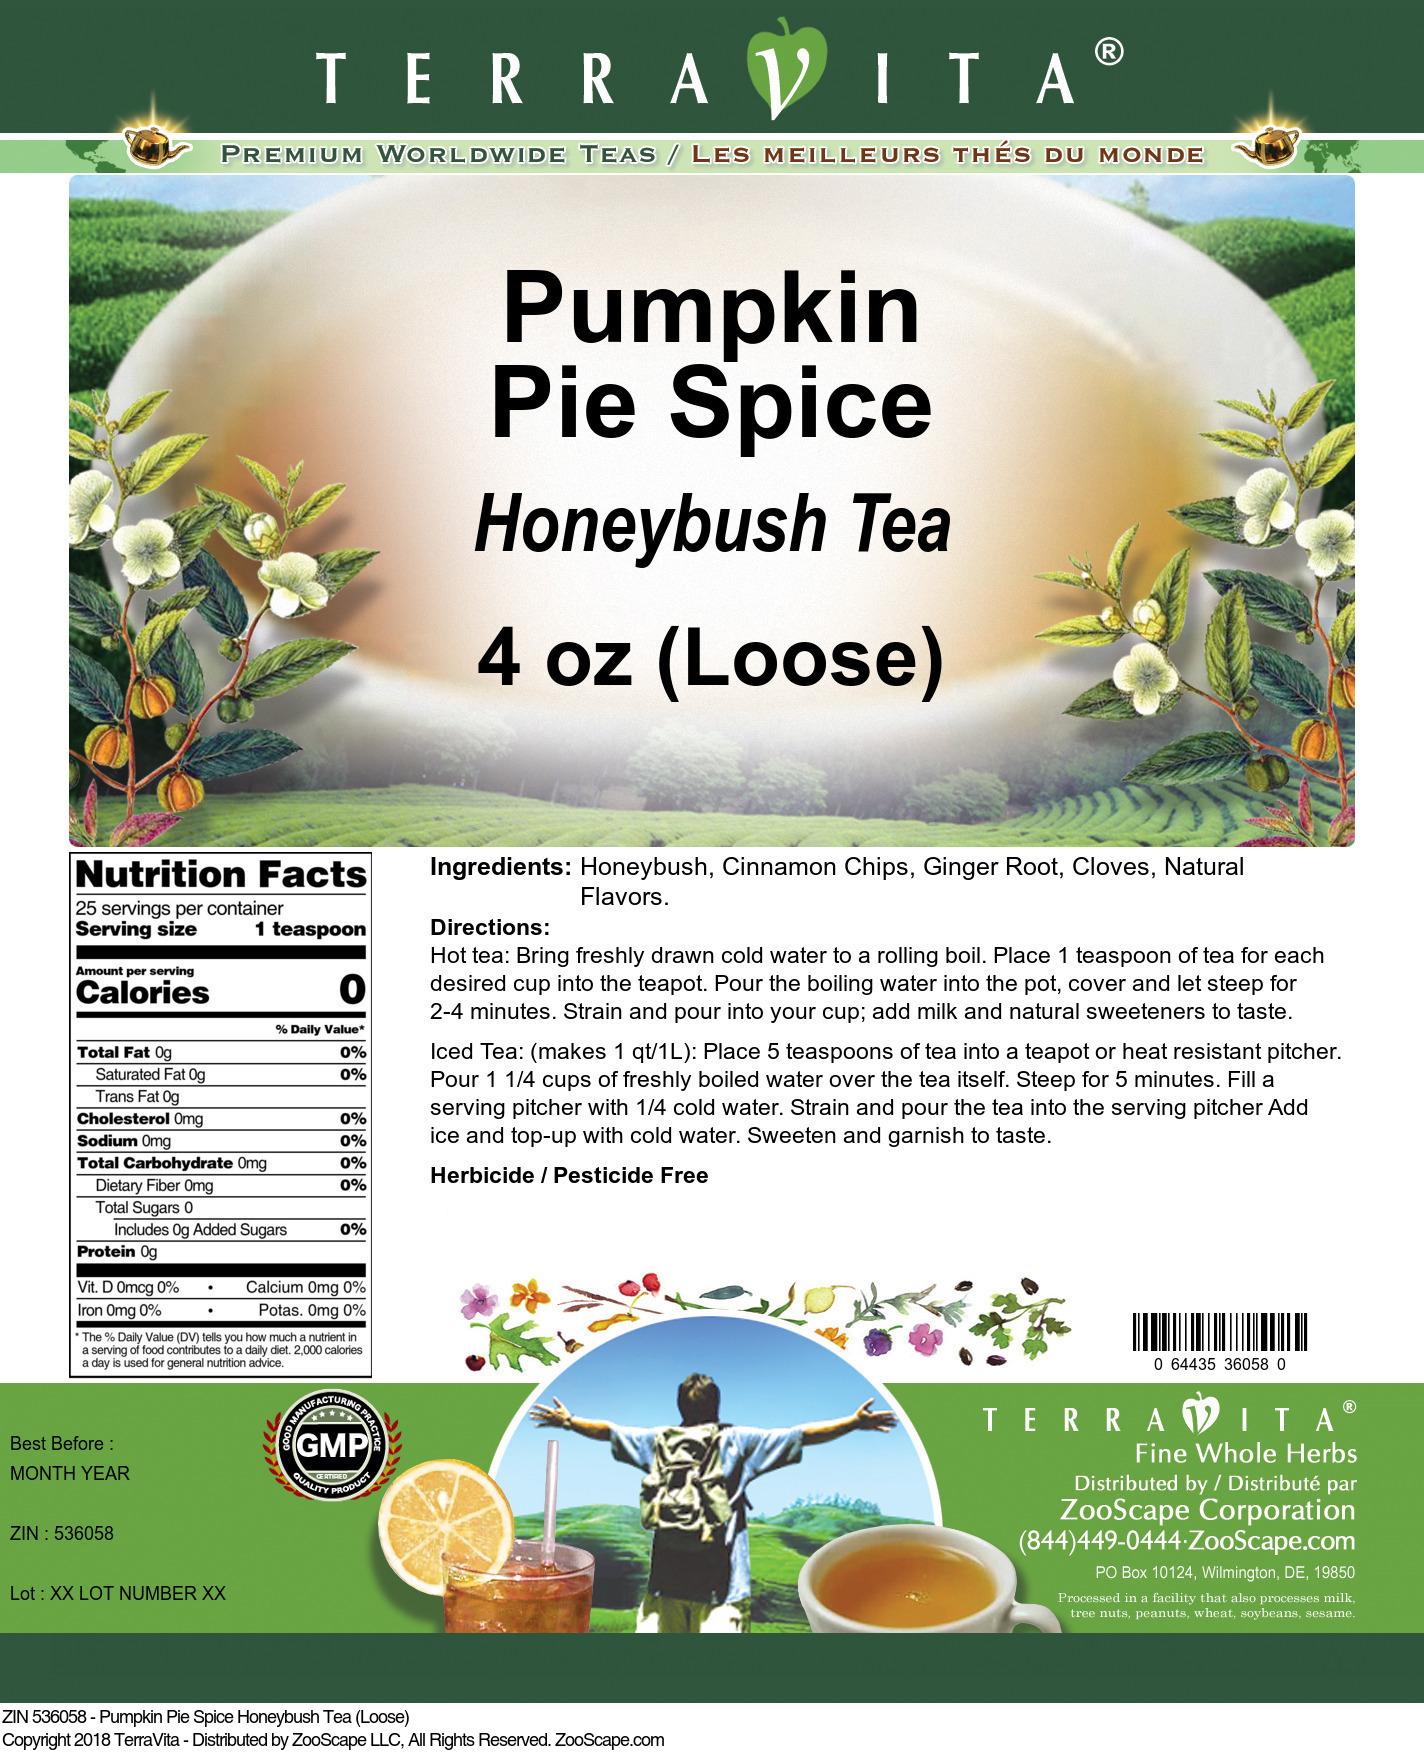 Pumpkin Pie Spice Honeybush Tea